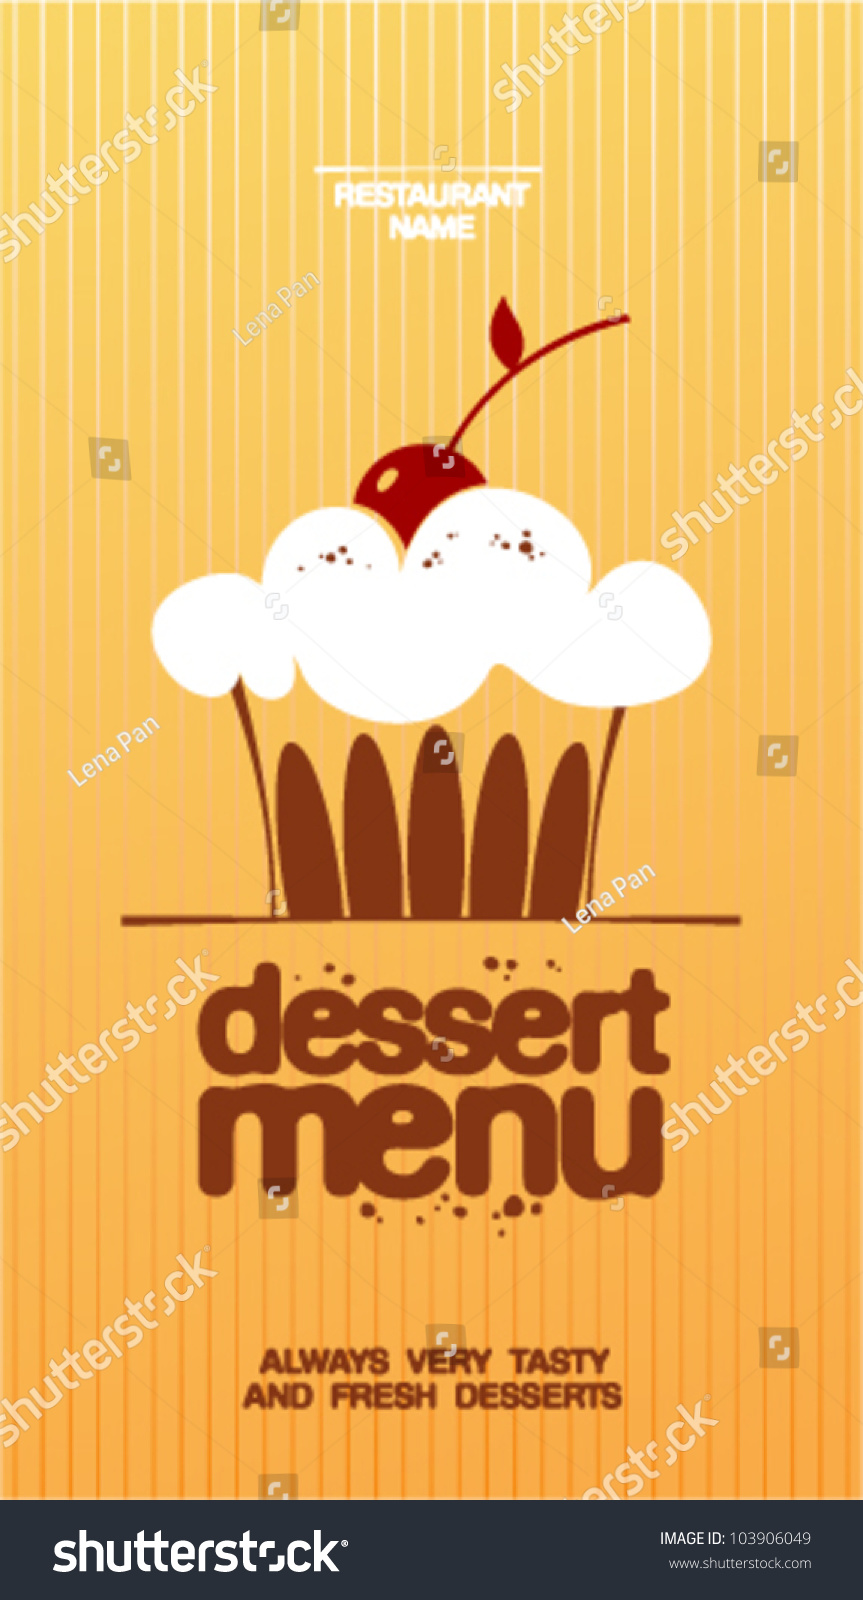 Dessert Menu Card Design Template Stock Vector 103906049